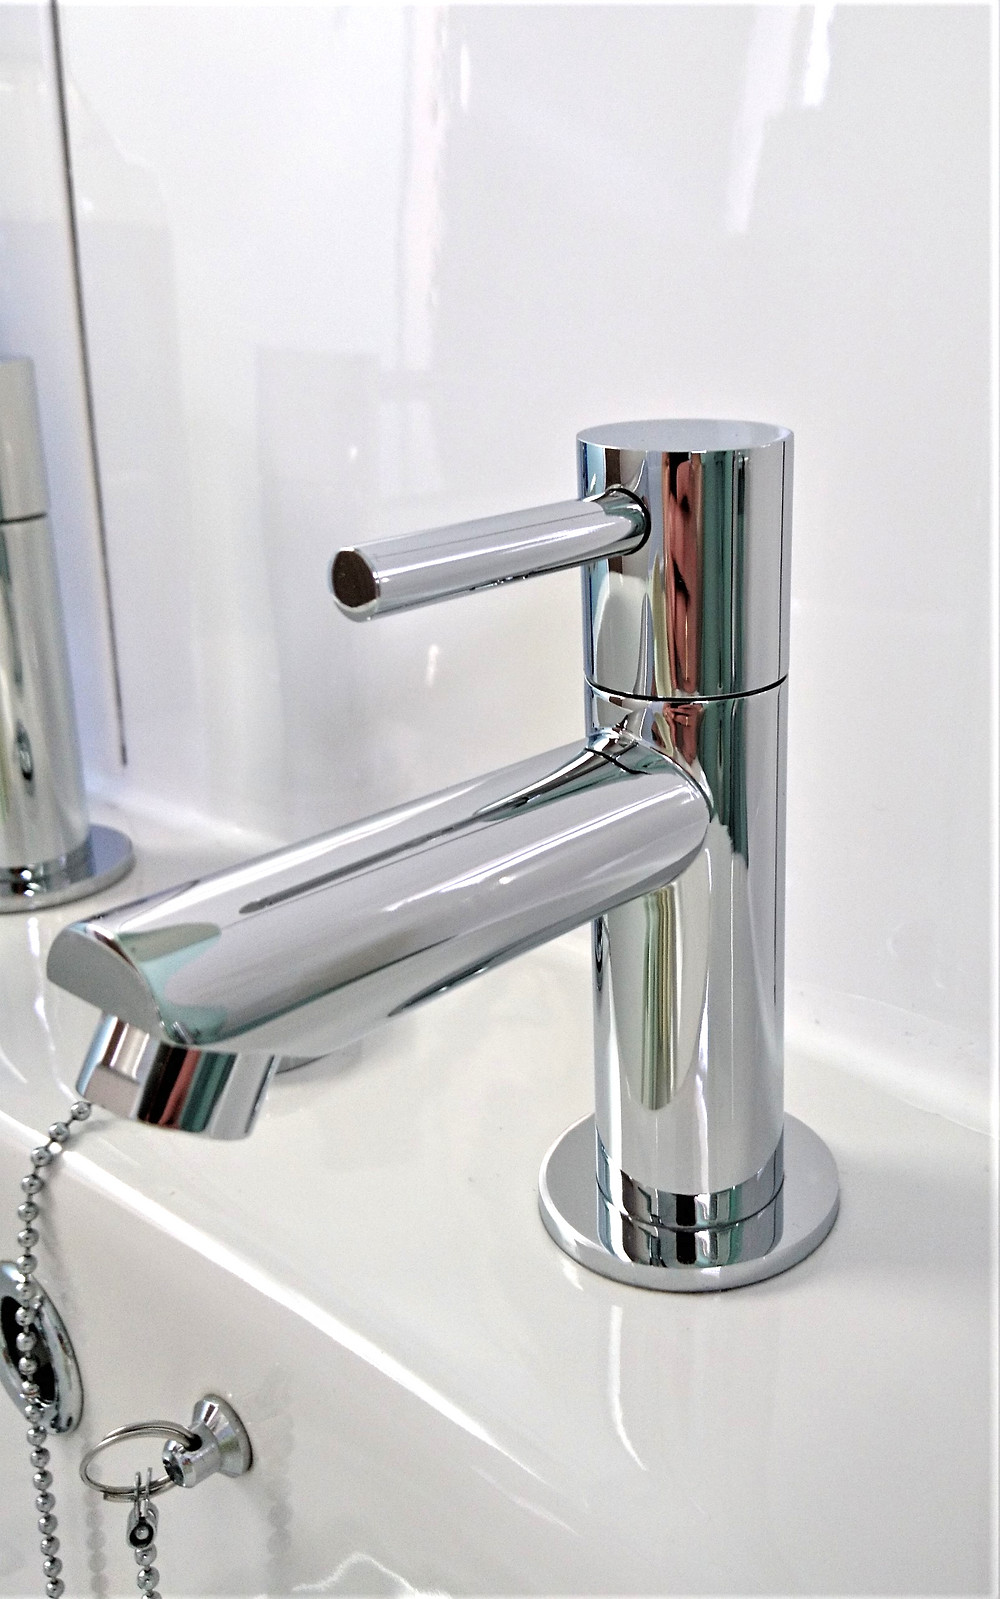 Shiny clean taps